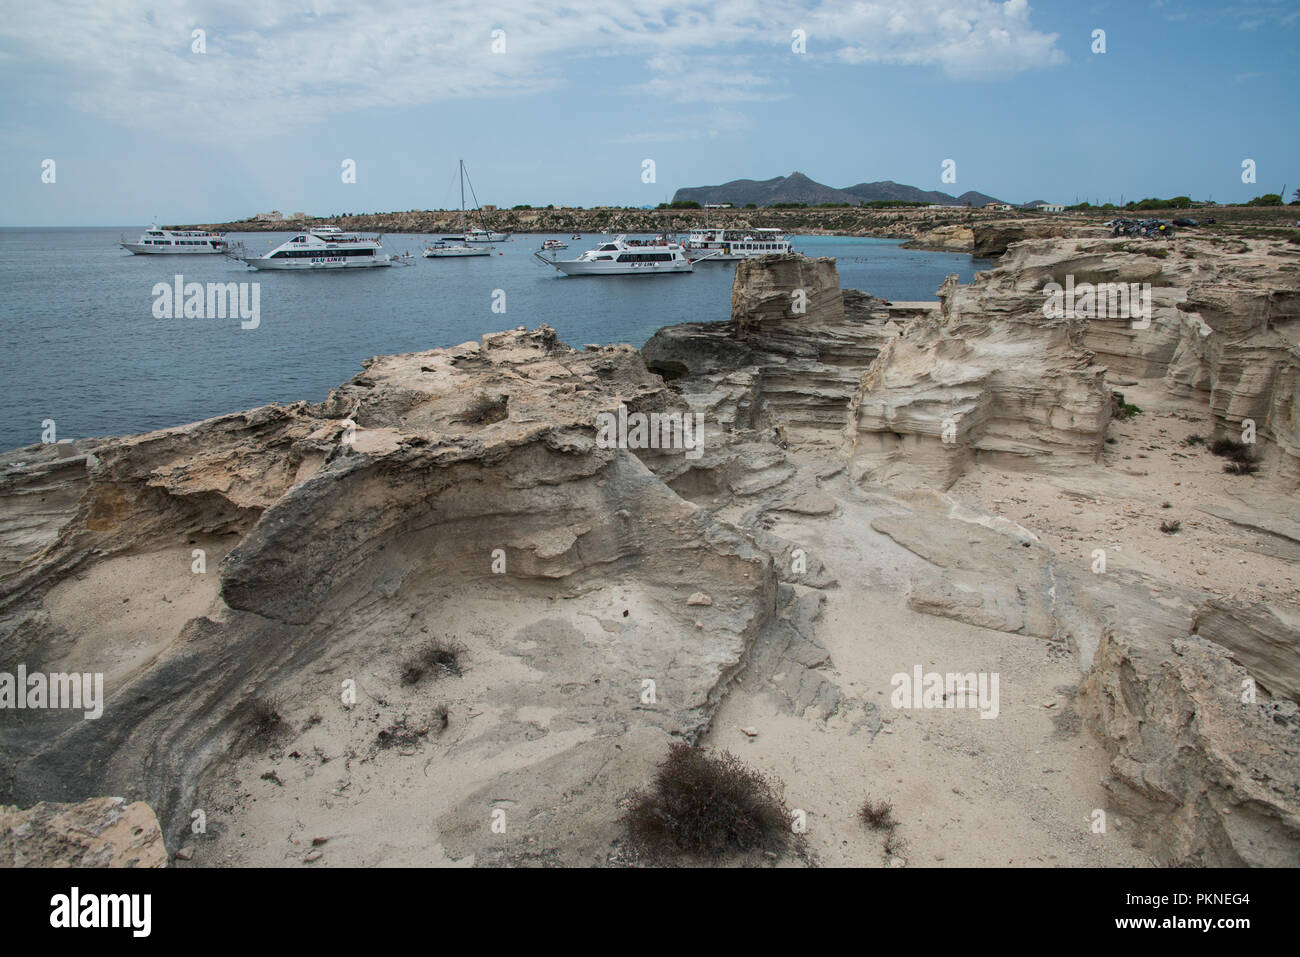 Felsküste und Badestrand auf der Insel Favignana nahe Neapel Stockbild